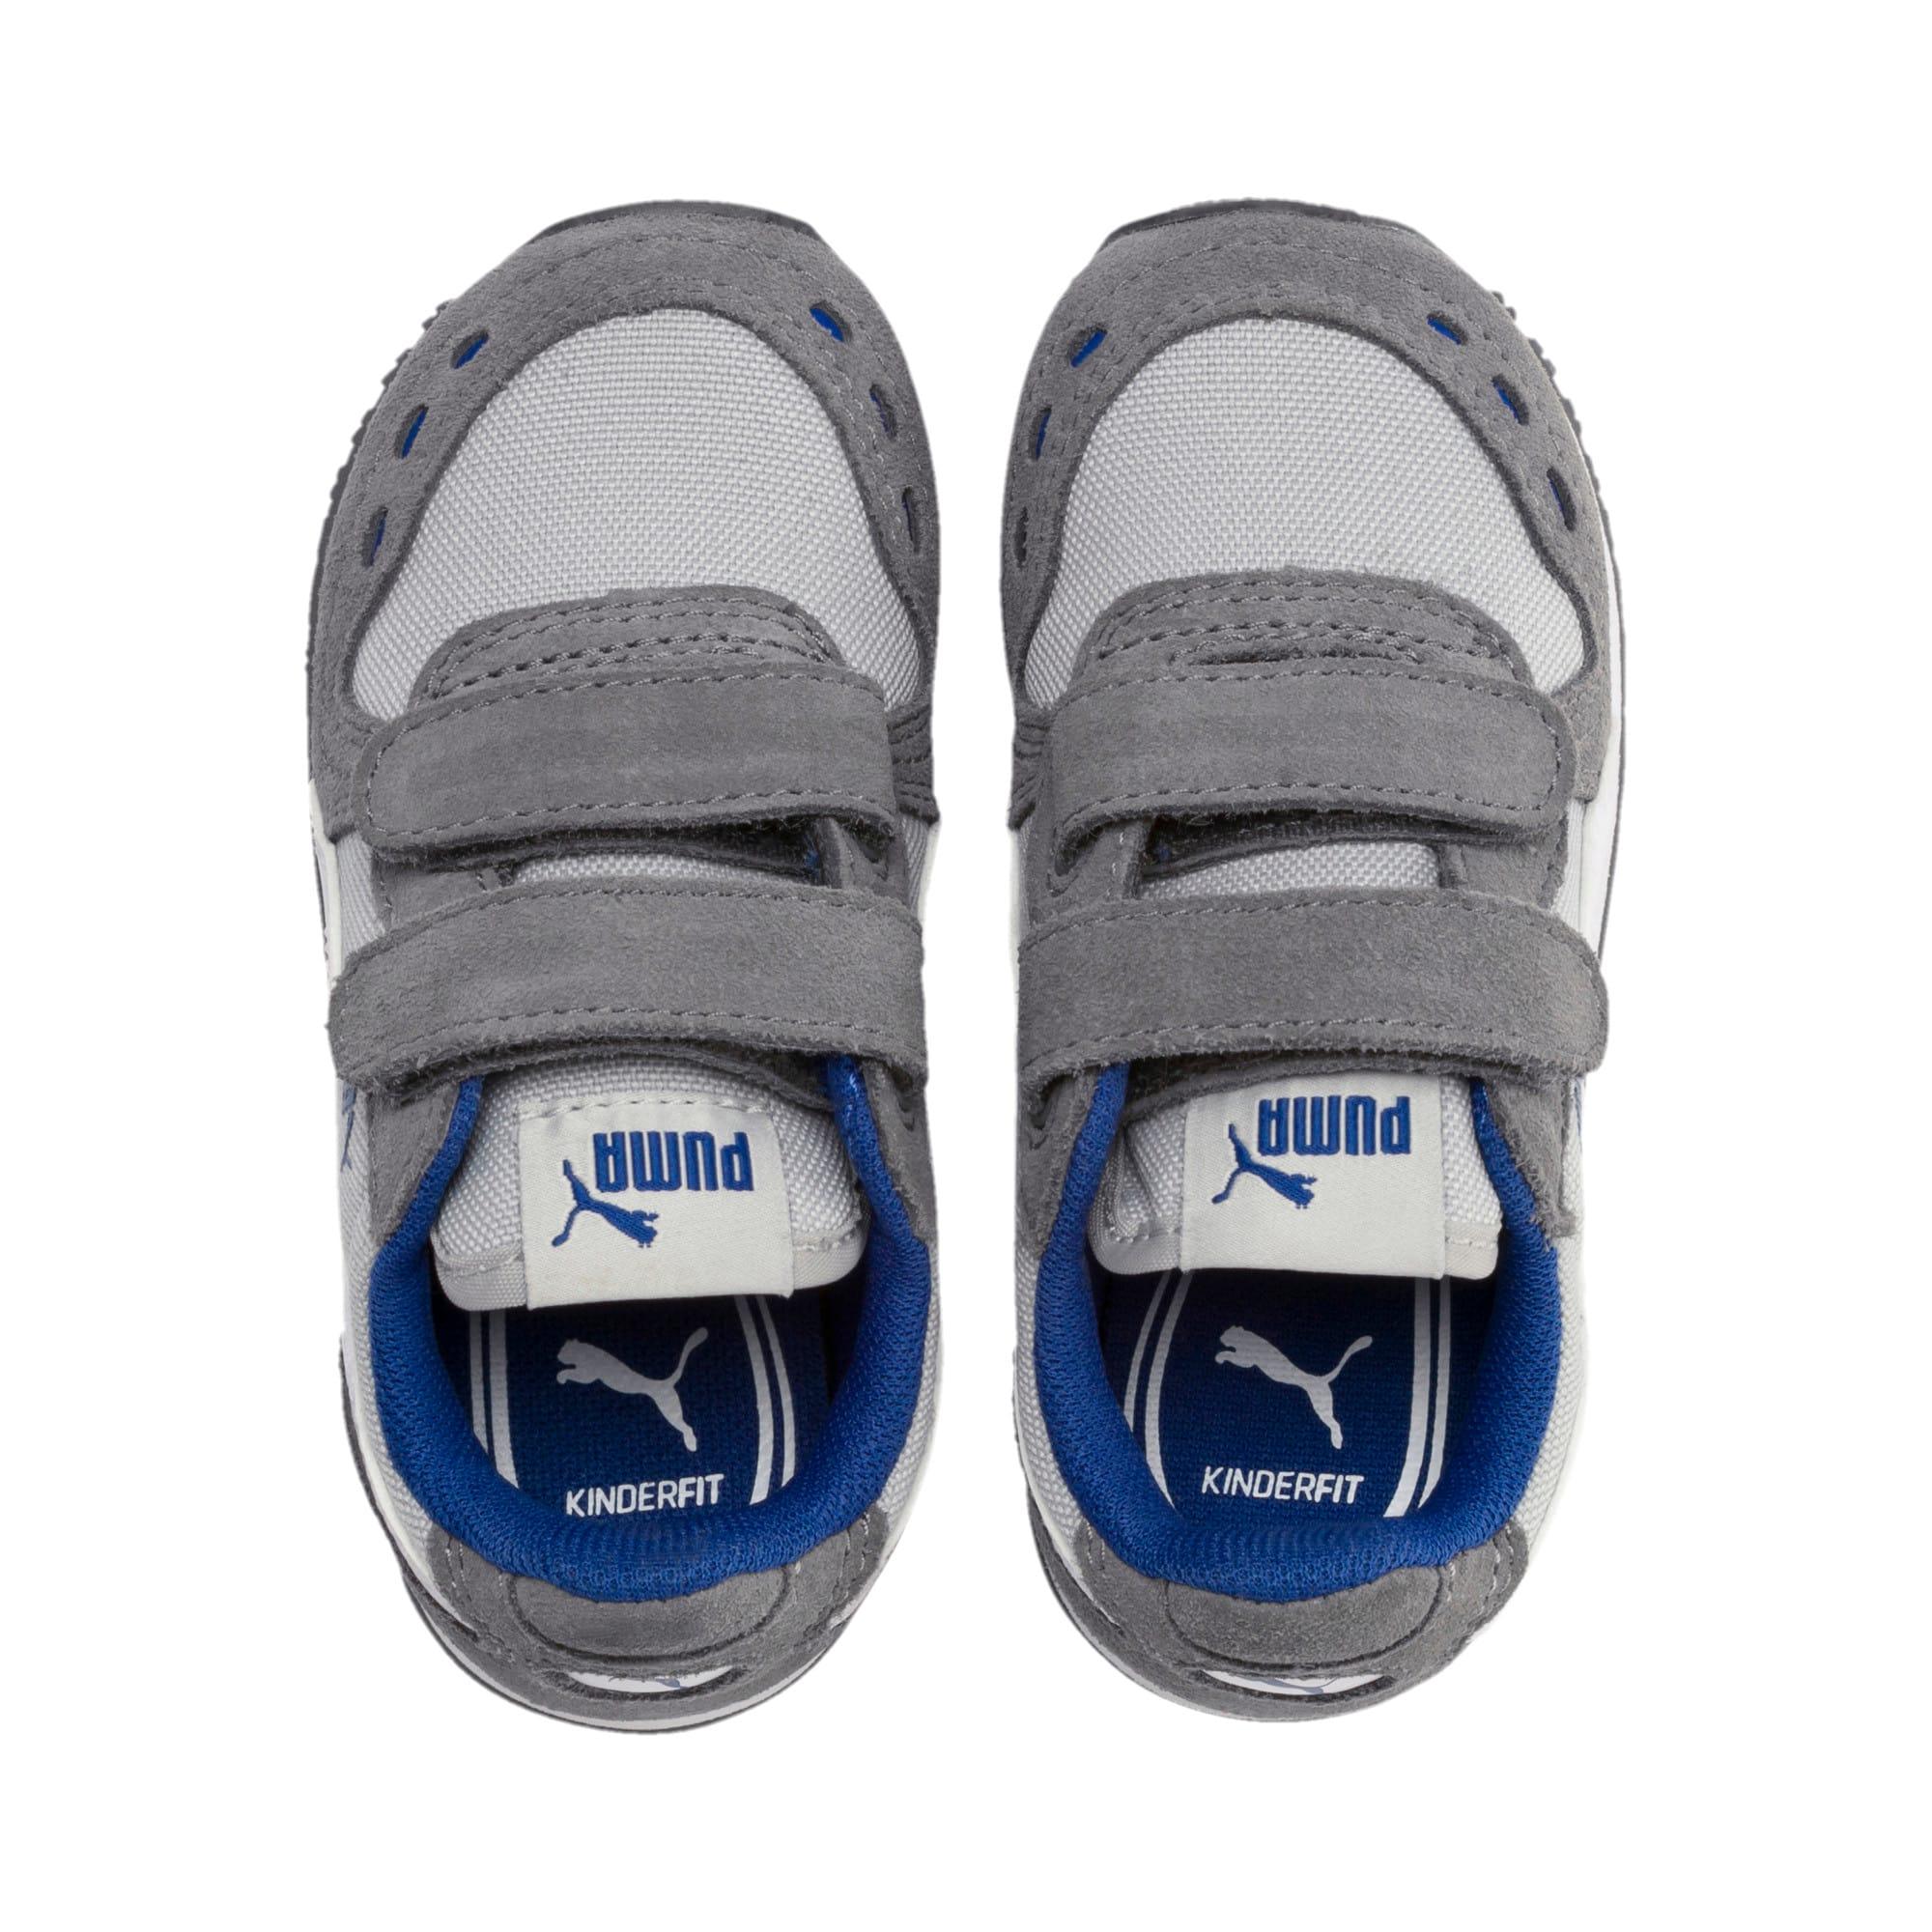 Thumbnail 6 of Cabana Racer Toddler Shoes, High Rise-CASTLEROCK, medium